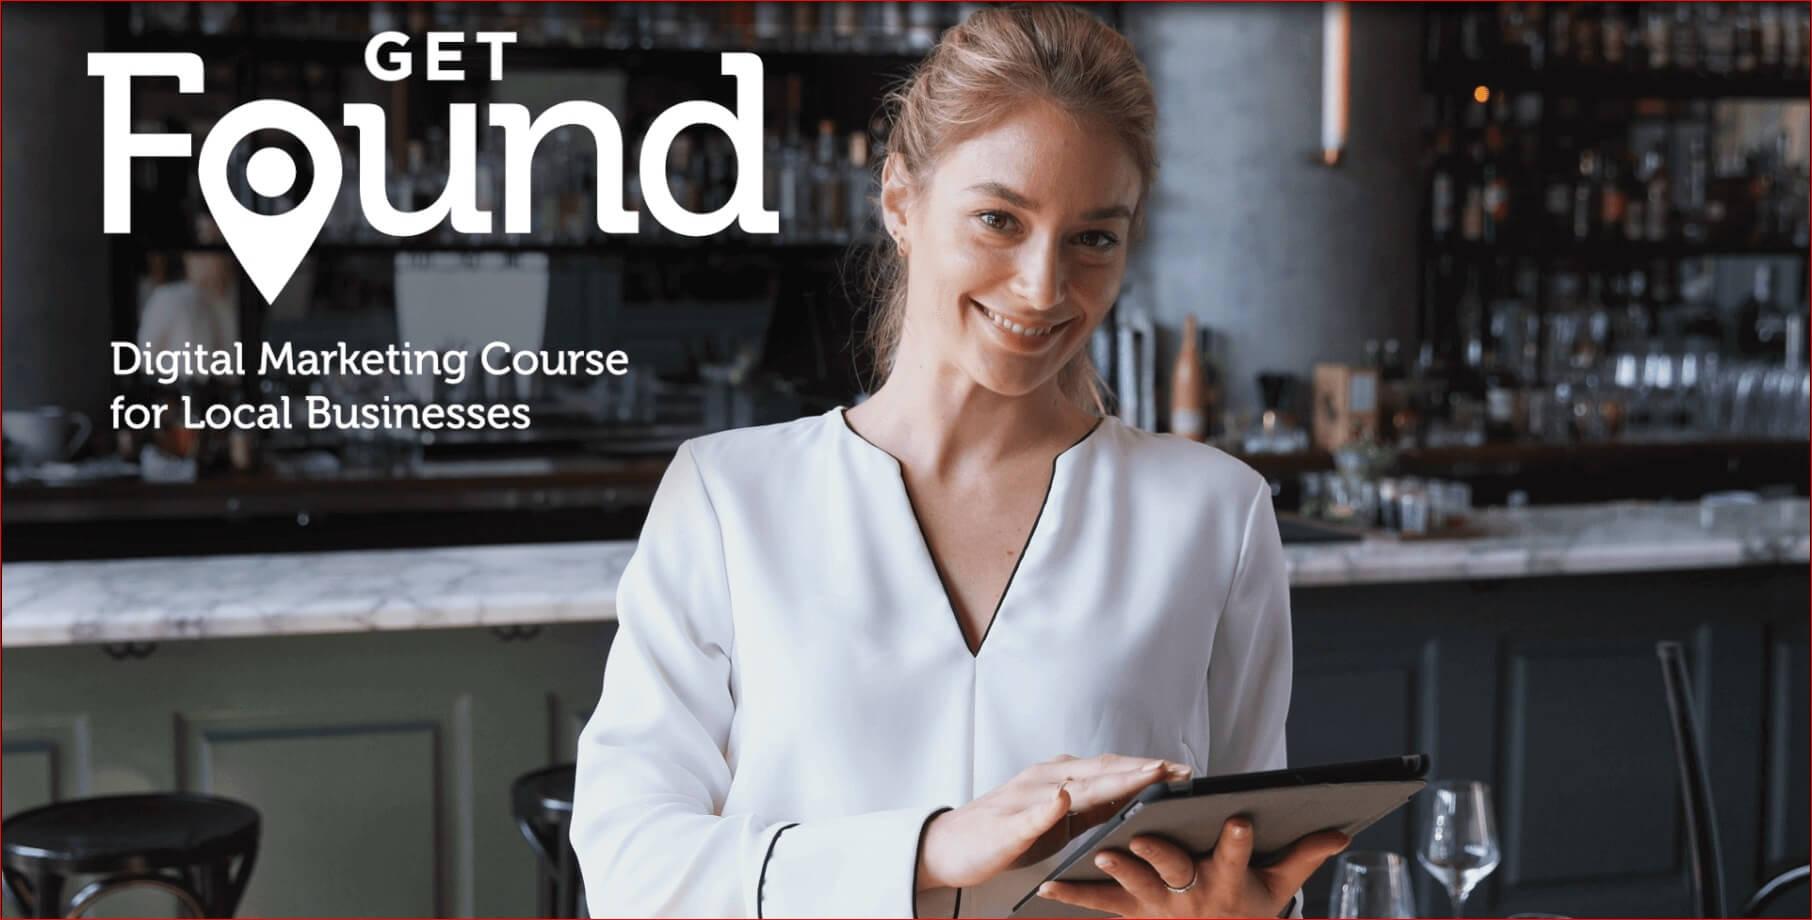 Get Found Digital Marketing for Local Business